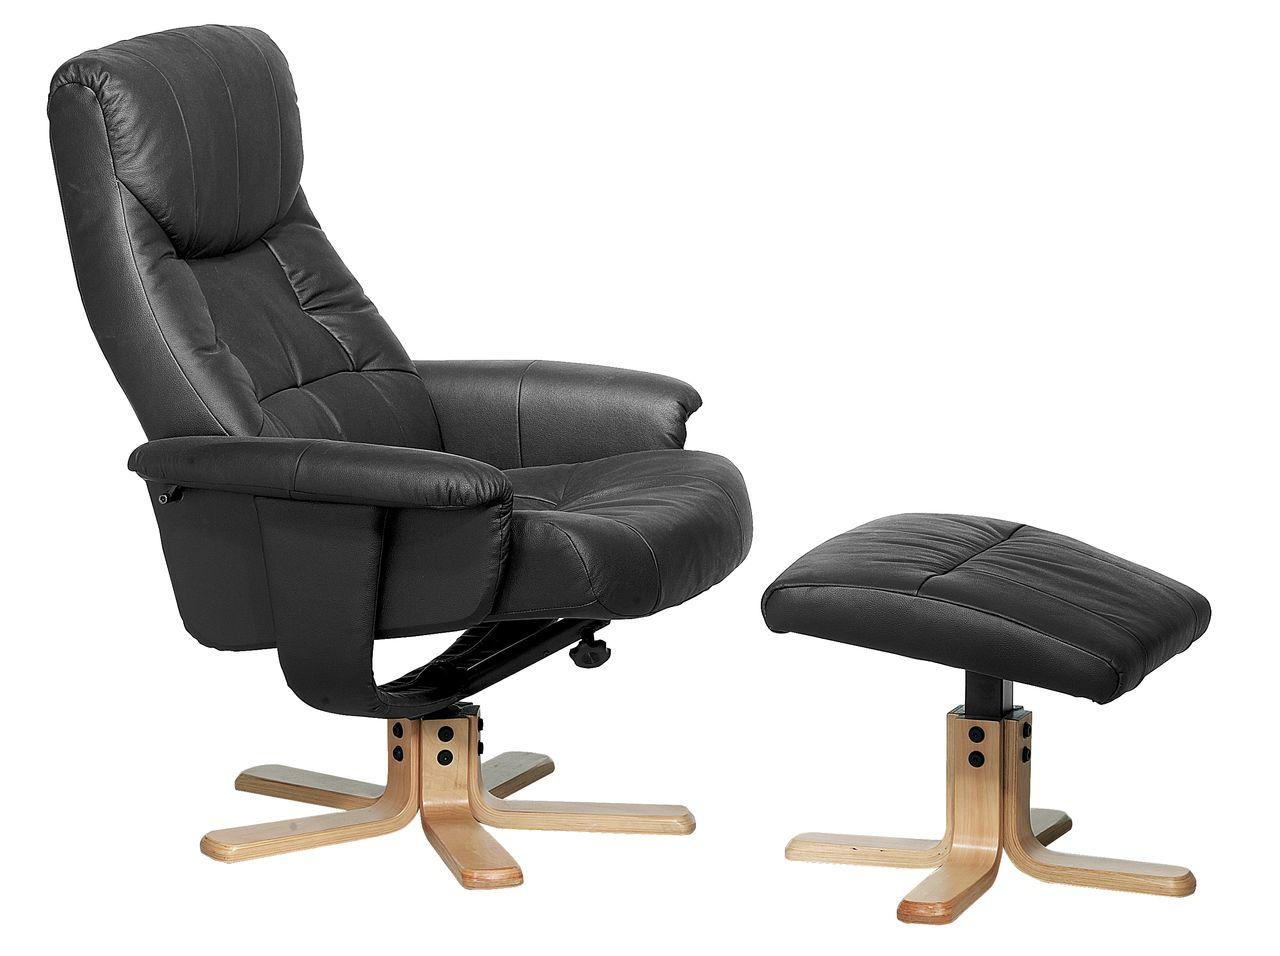 Armchair w/footstool HUNDSLUND black | JYSK